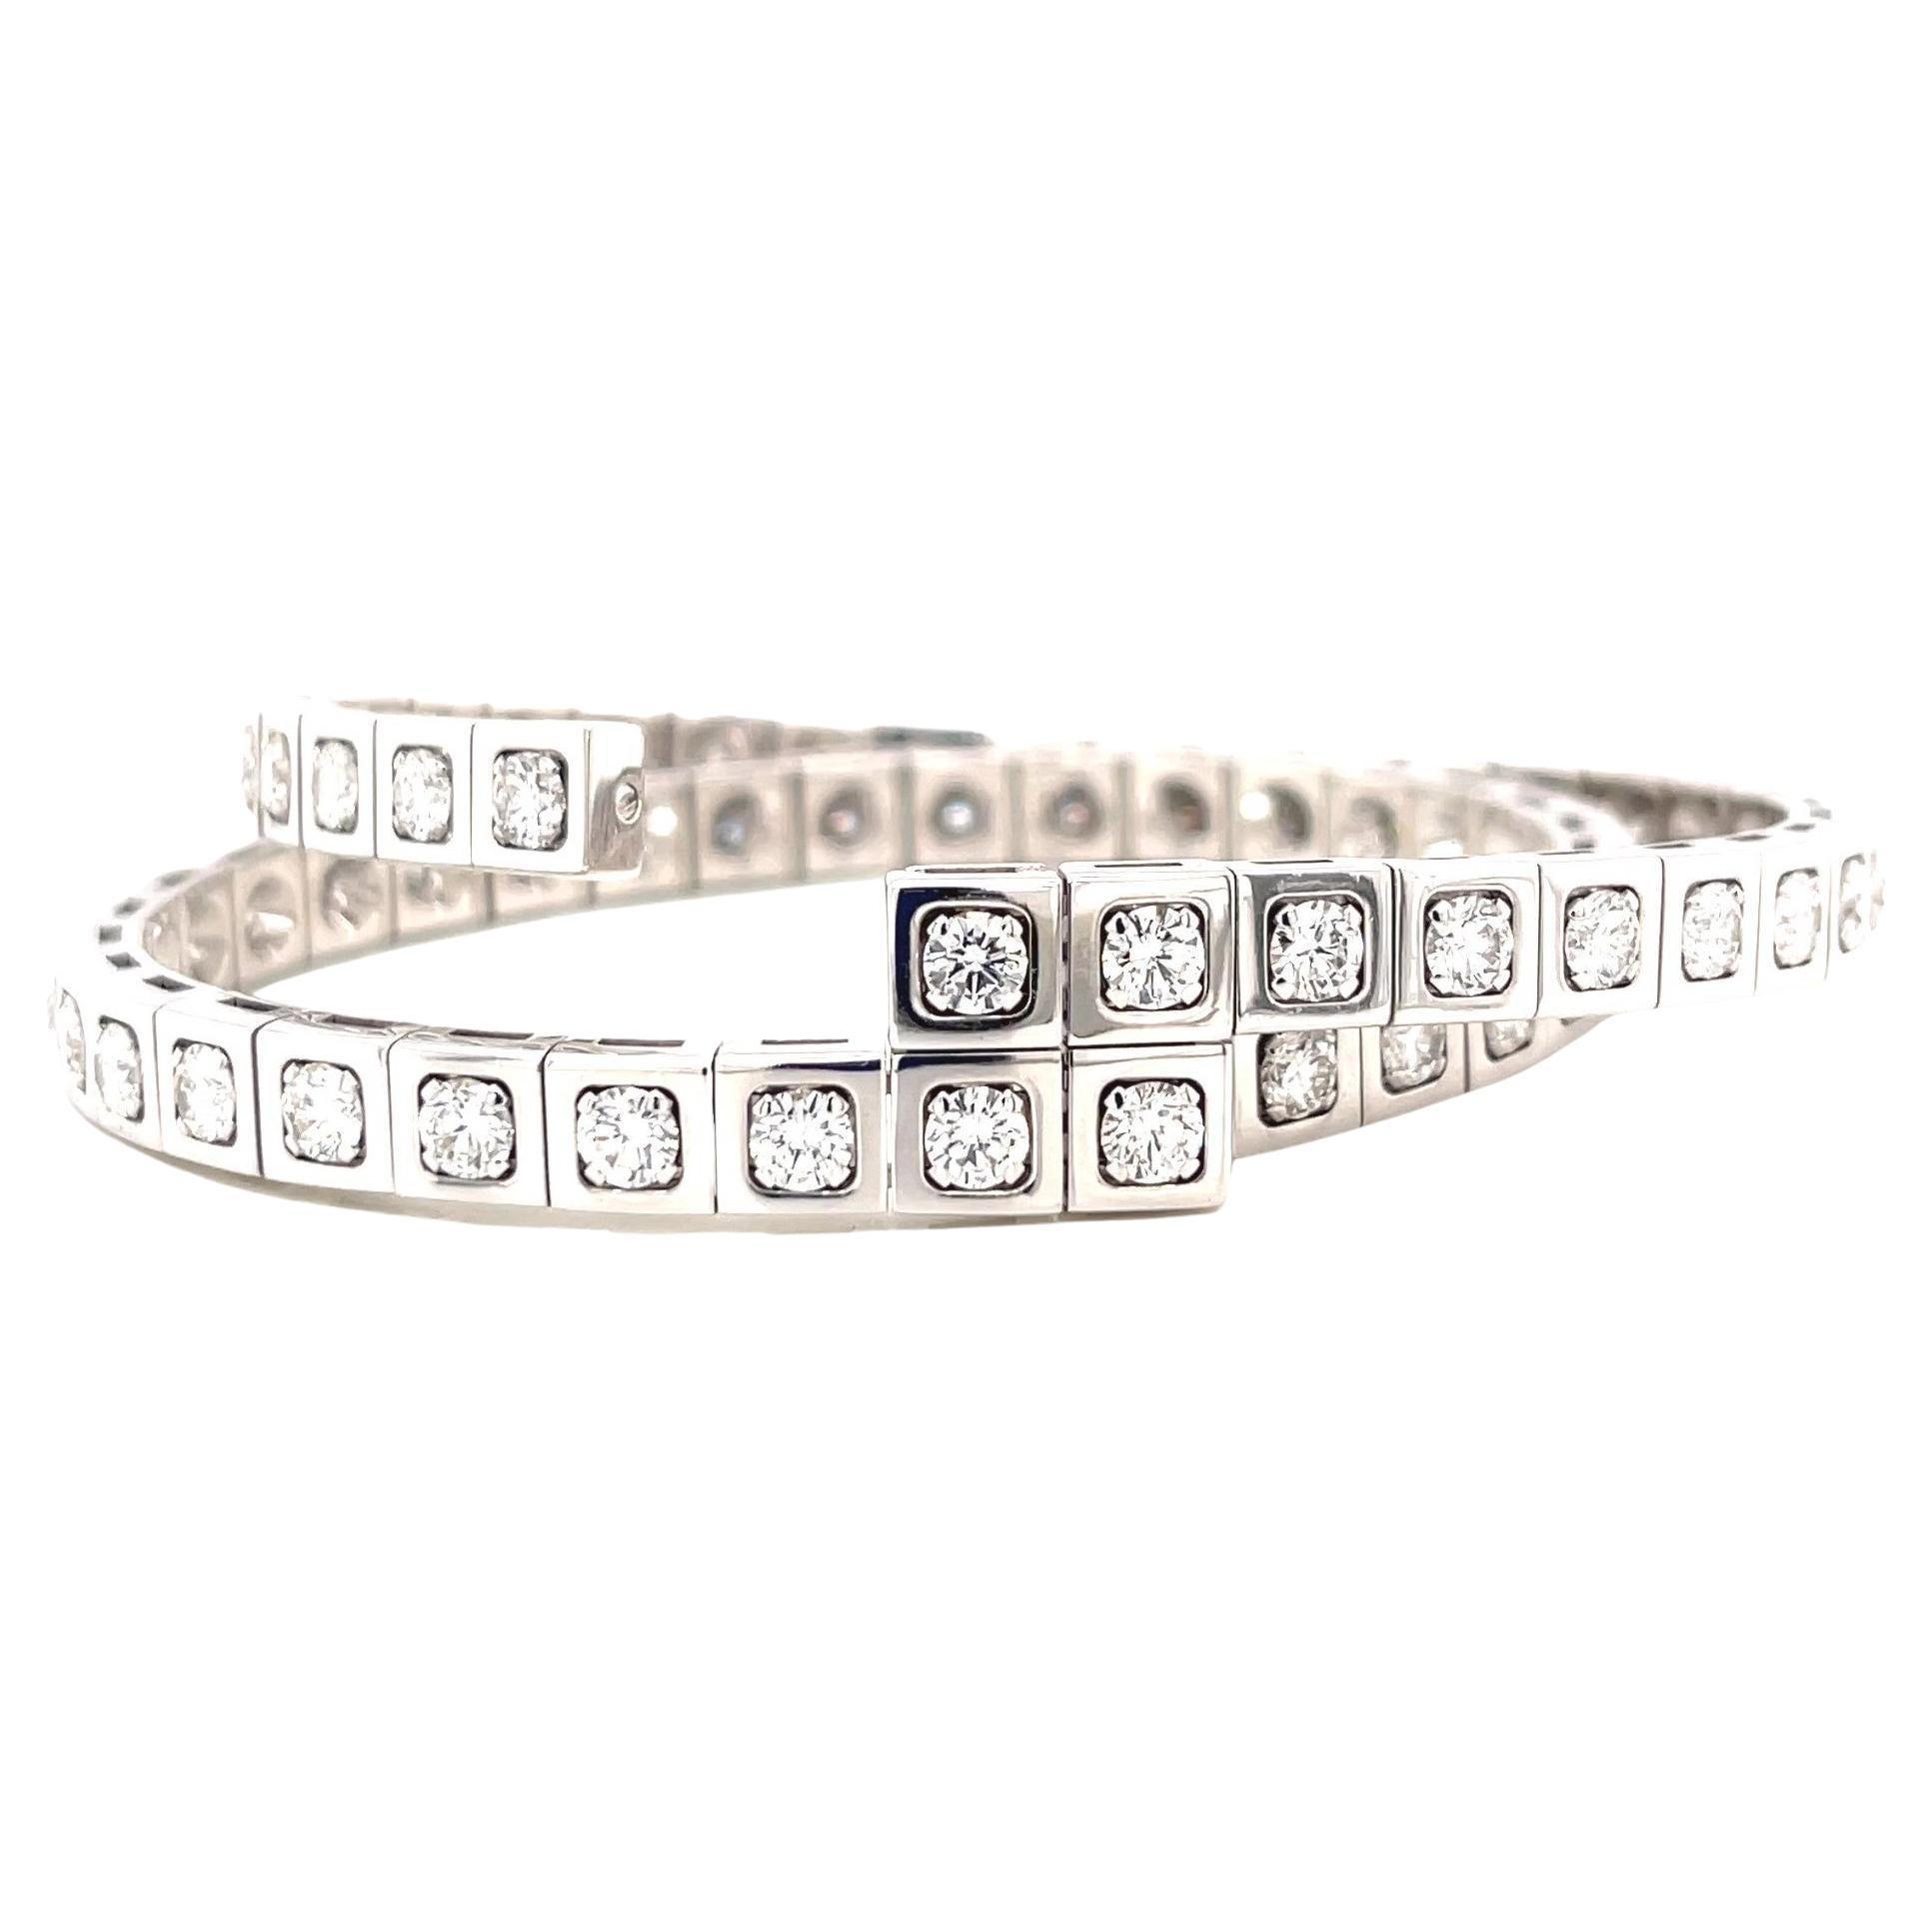 Vintage Cartier Techtonique Double Row Diamond 18 Karat White Gold Bracelet